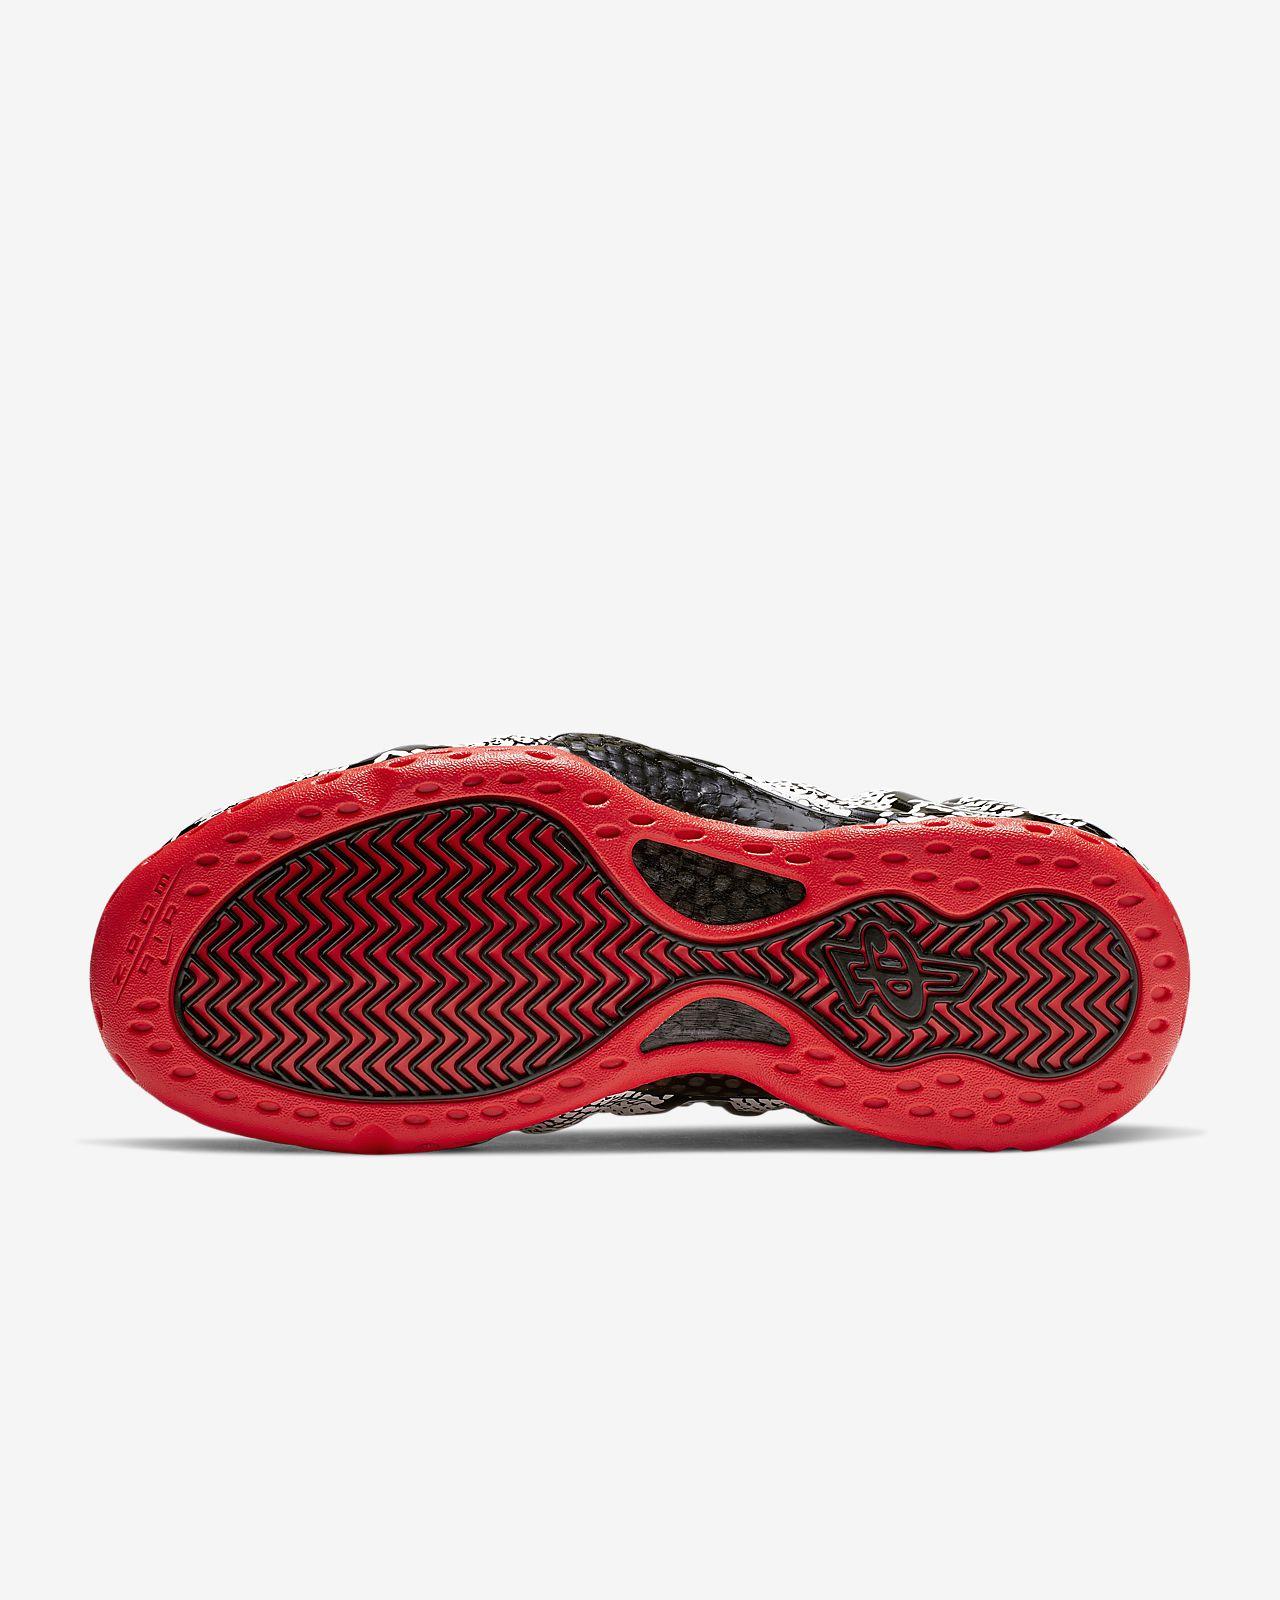 c44f4d8034 Nike Air Foamposite One Men's Shoe. Nike.com